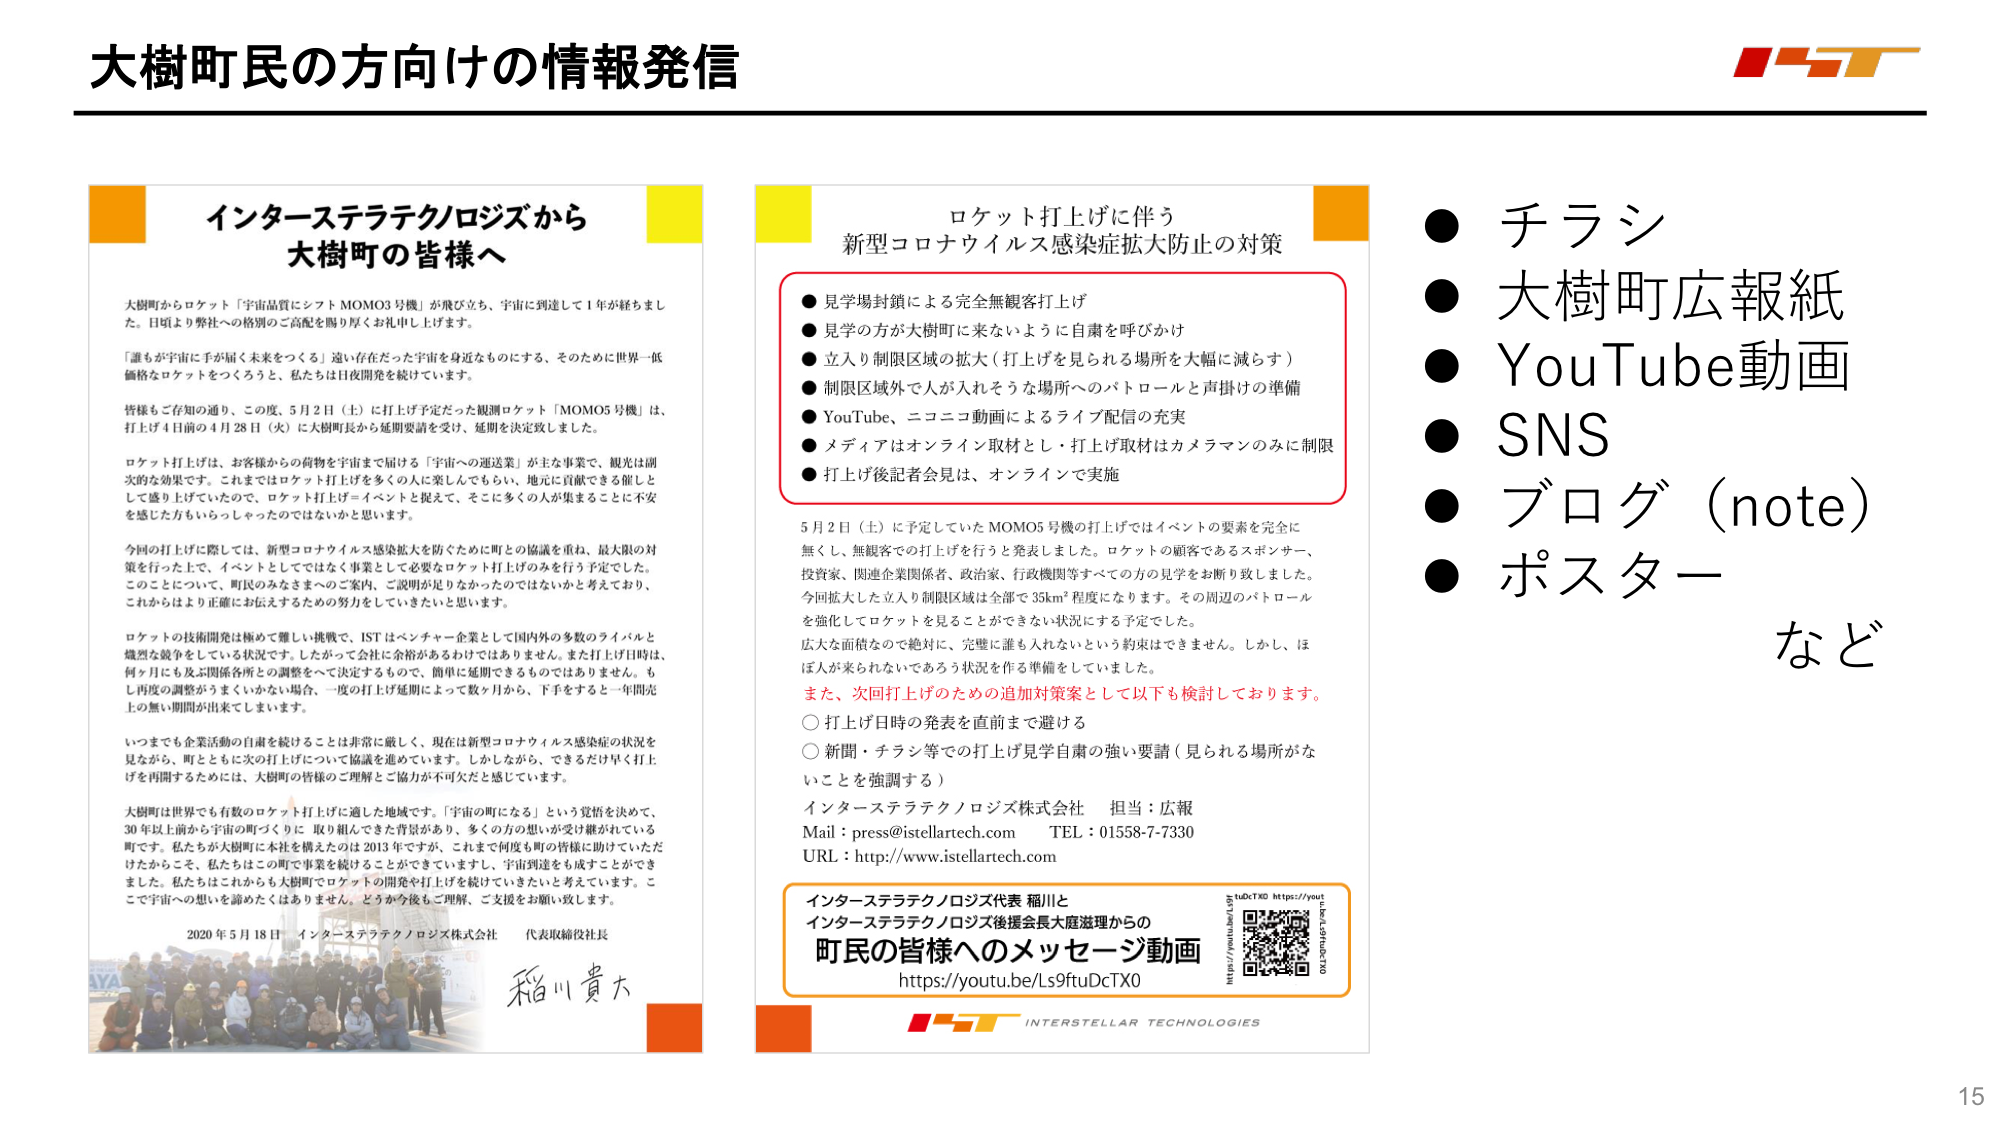 f:id:Imamura:20200603232836p:plain